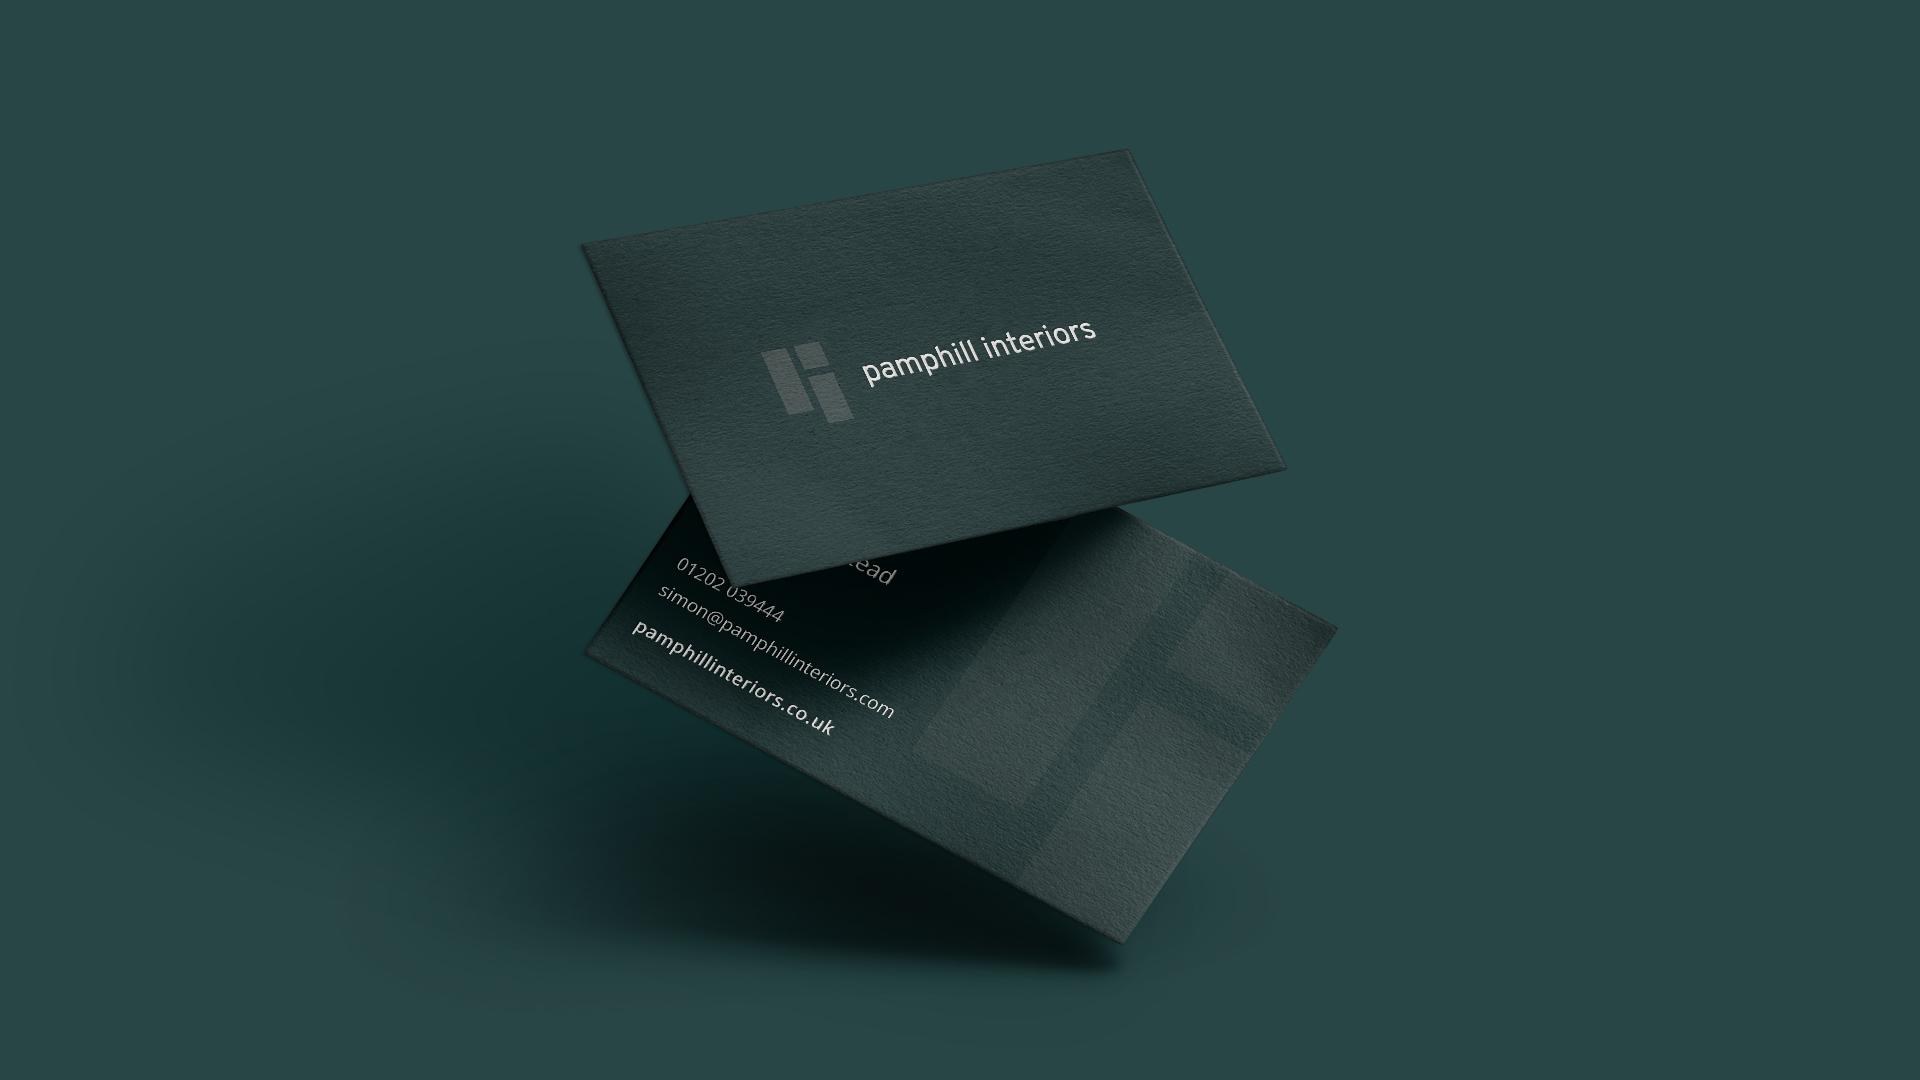 06-Lobo-Creative-Pamphill-Interiors-branding-logo-design-case-study.jpg